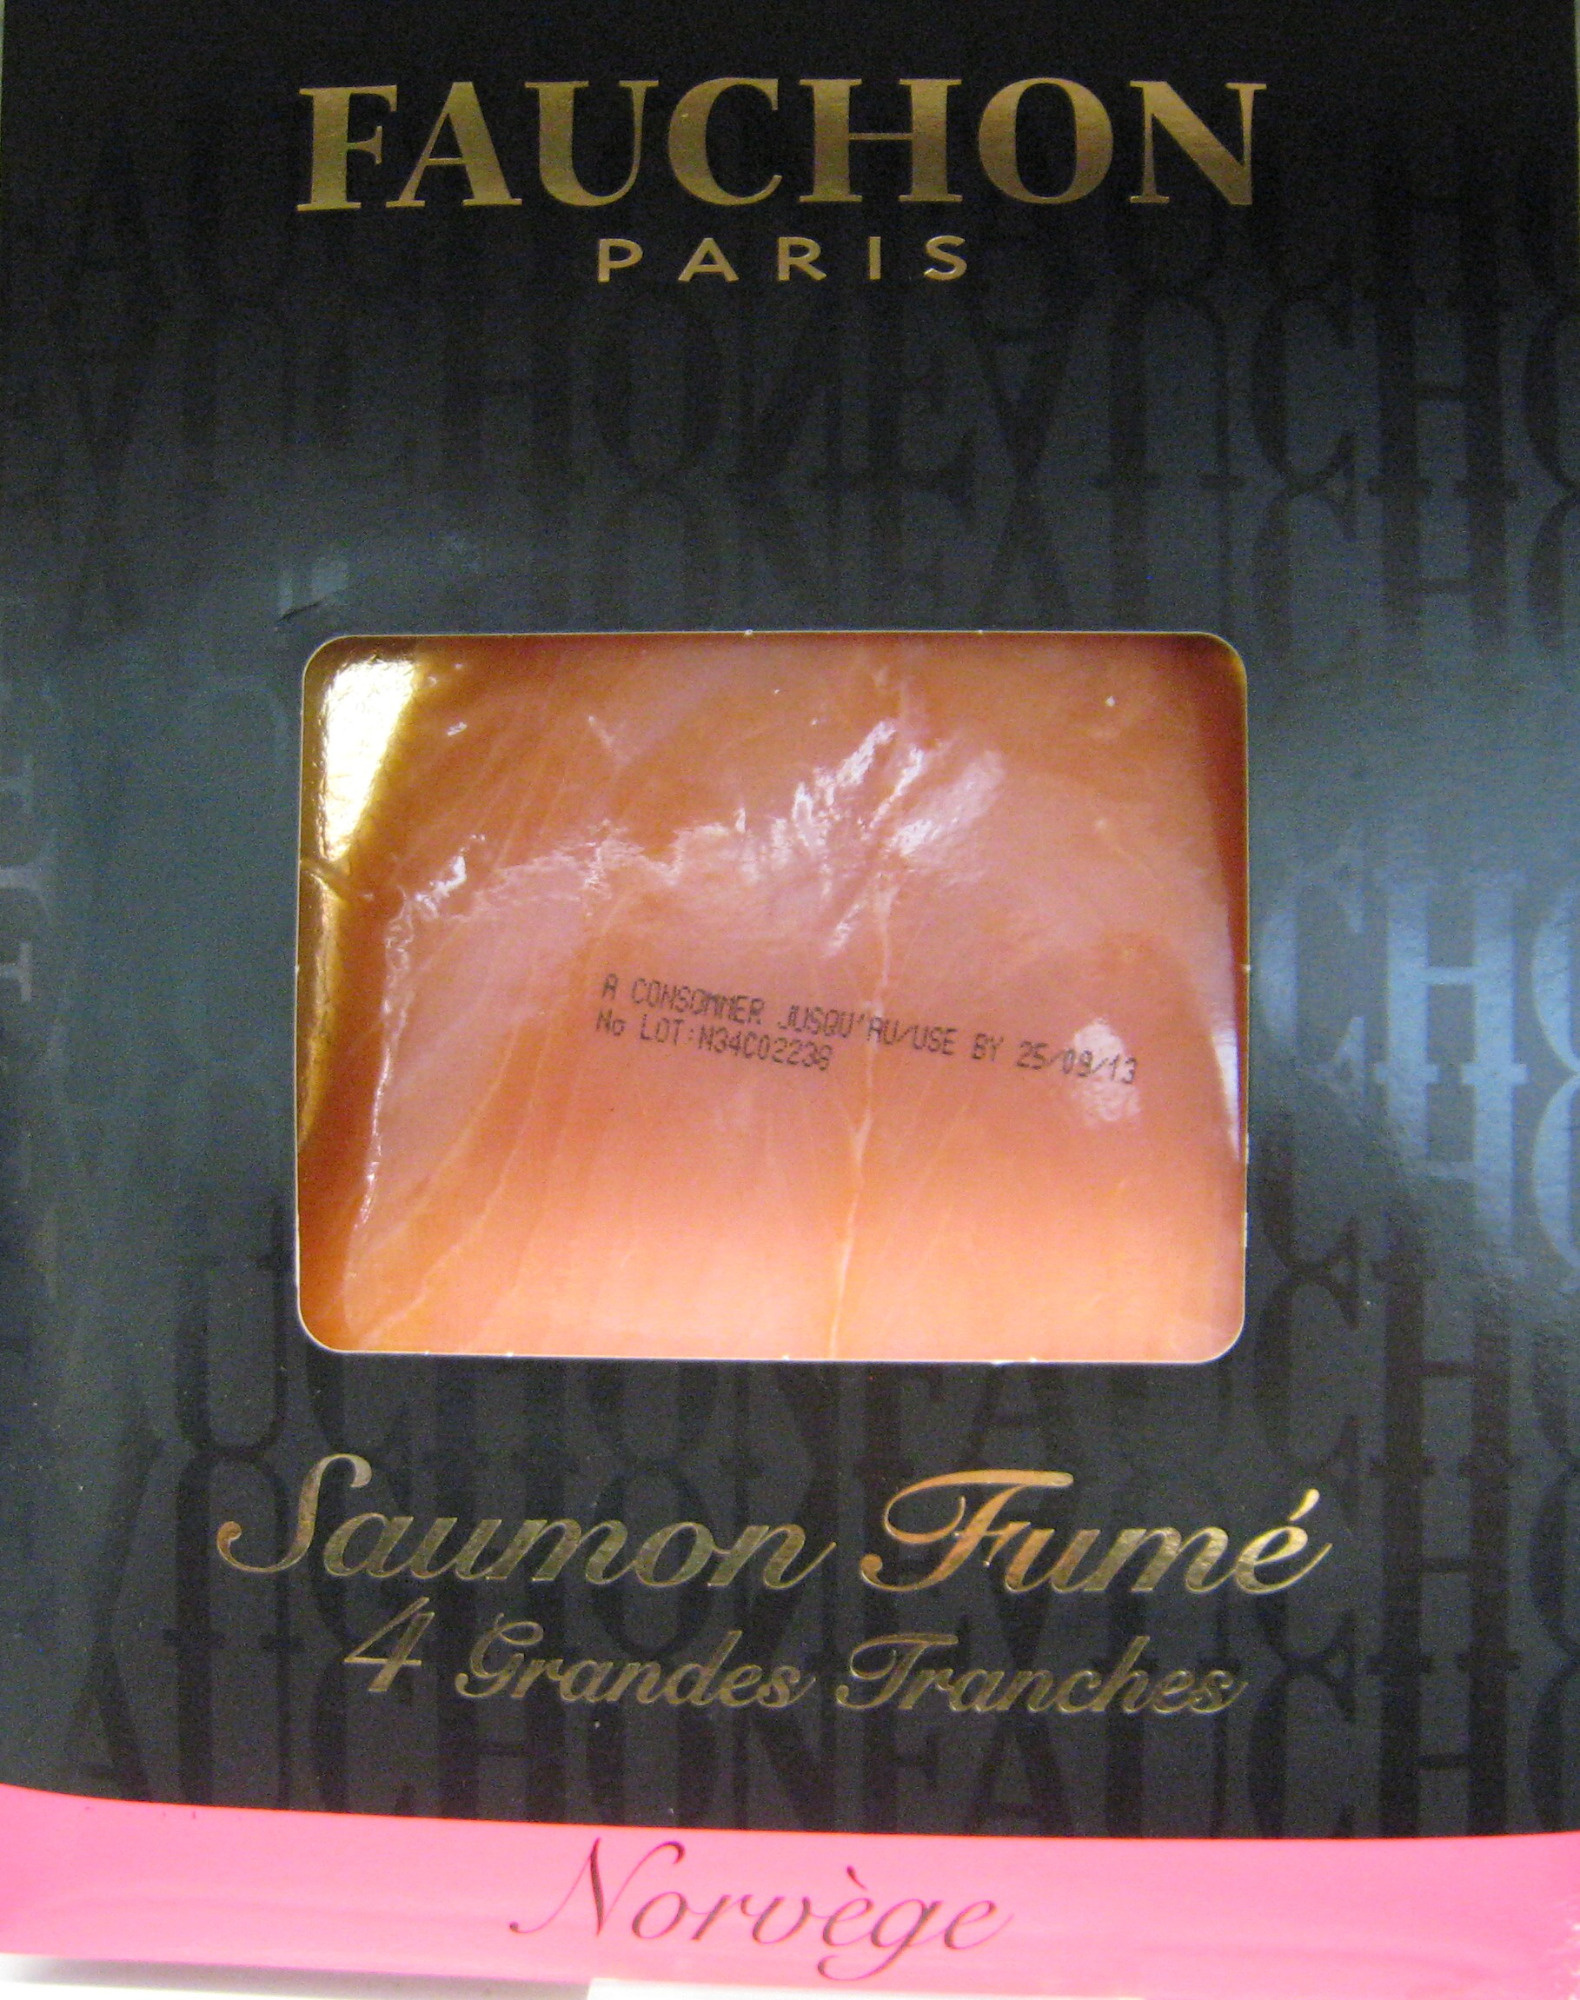 Saumon fumé 4 grandes tranches Norvège Fauchon - Producto